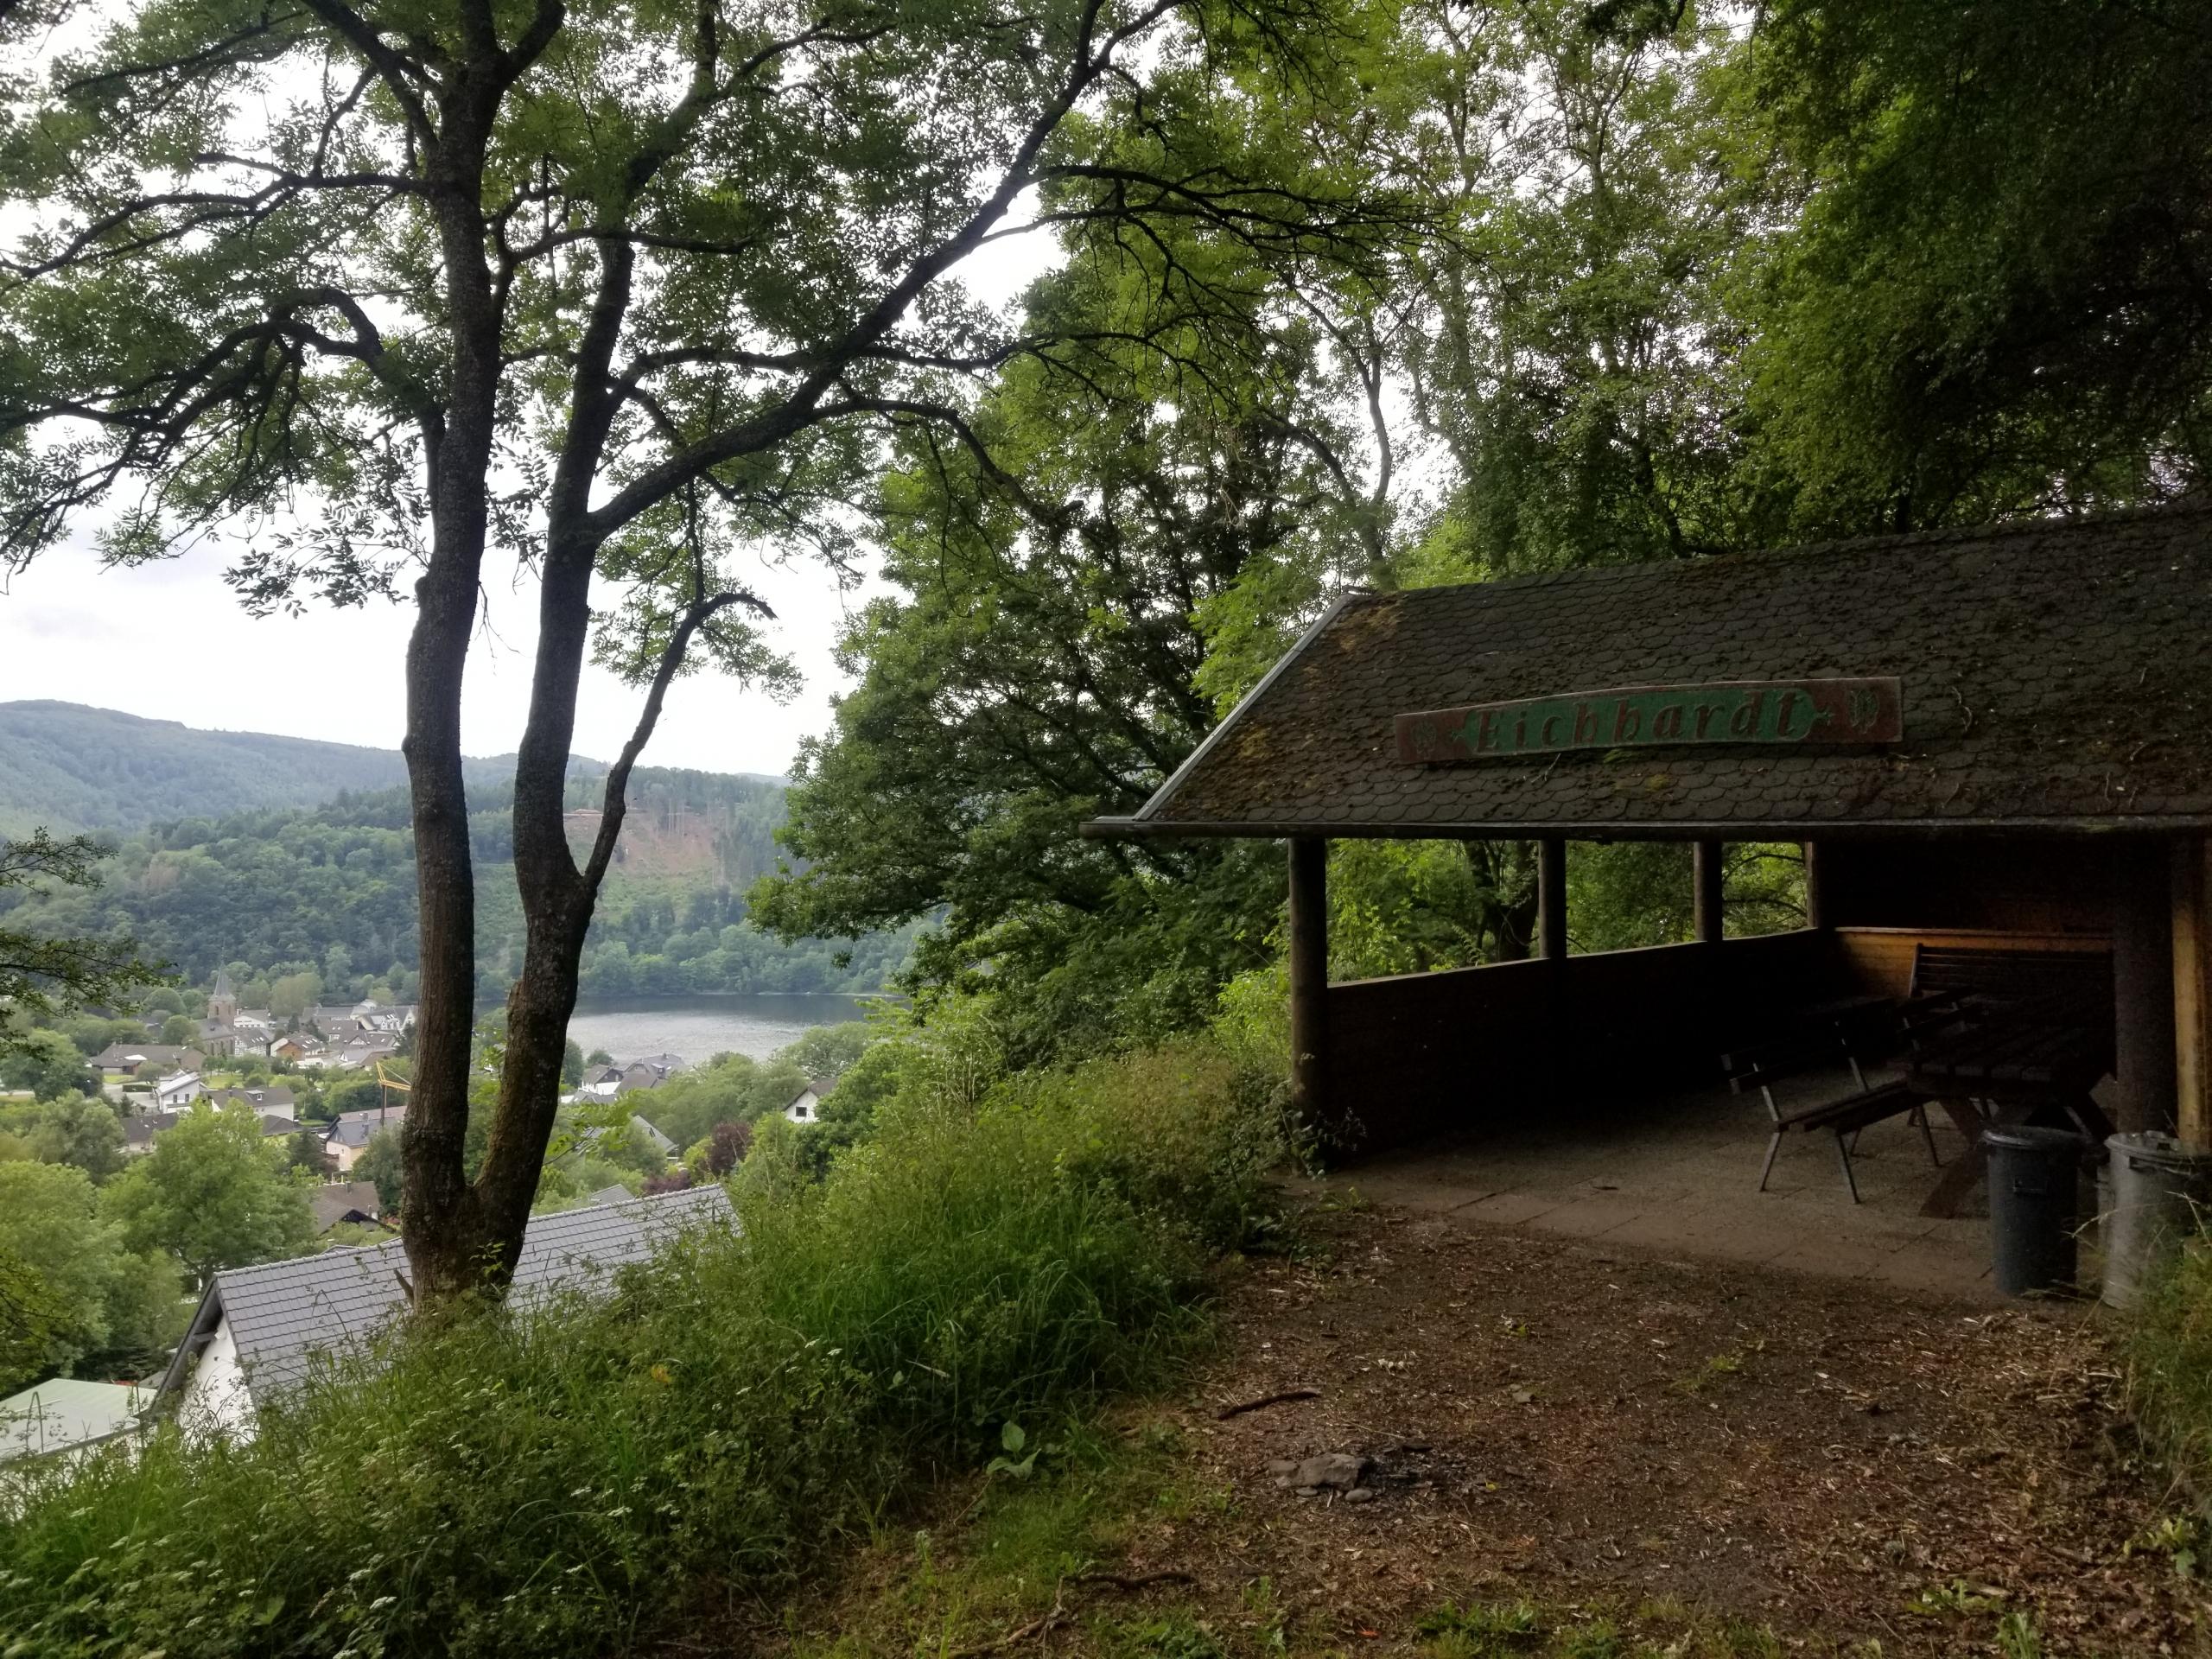 Eichhardthütte